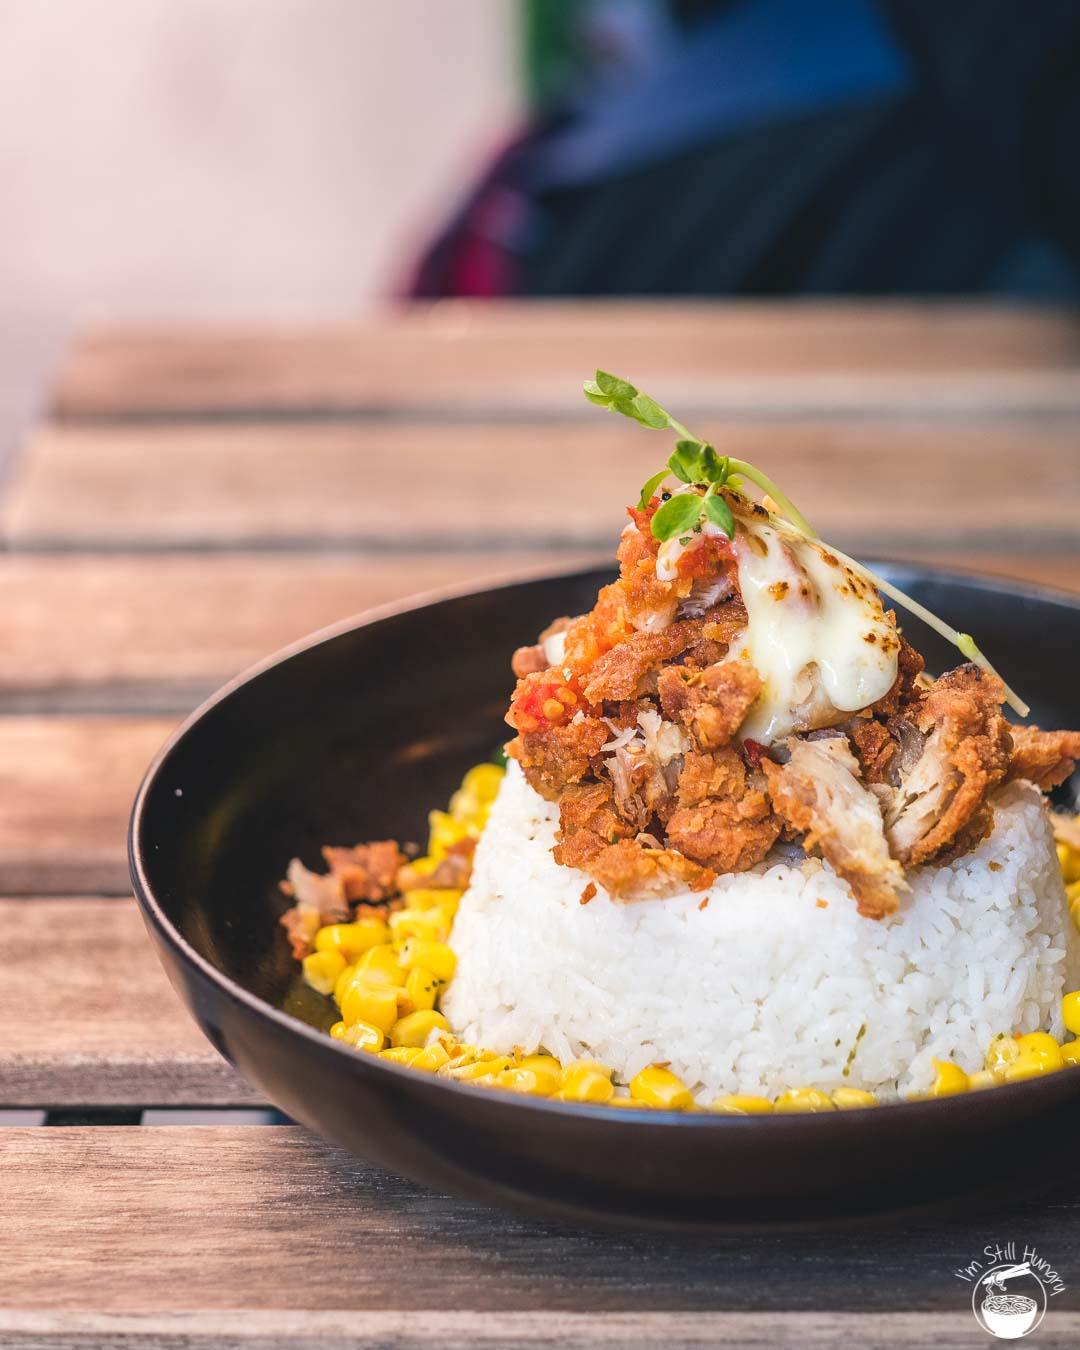 Kusuka Cafe Chicken winner: melty cheesy mozzarella on Kusuka homemade fried chicken w/specialty taichan chilli & rice (ayam geprek chili taichan mozza)